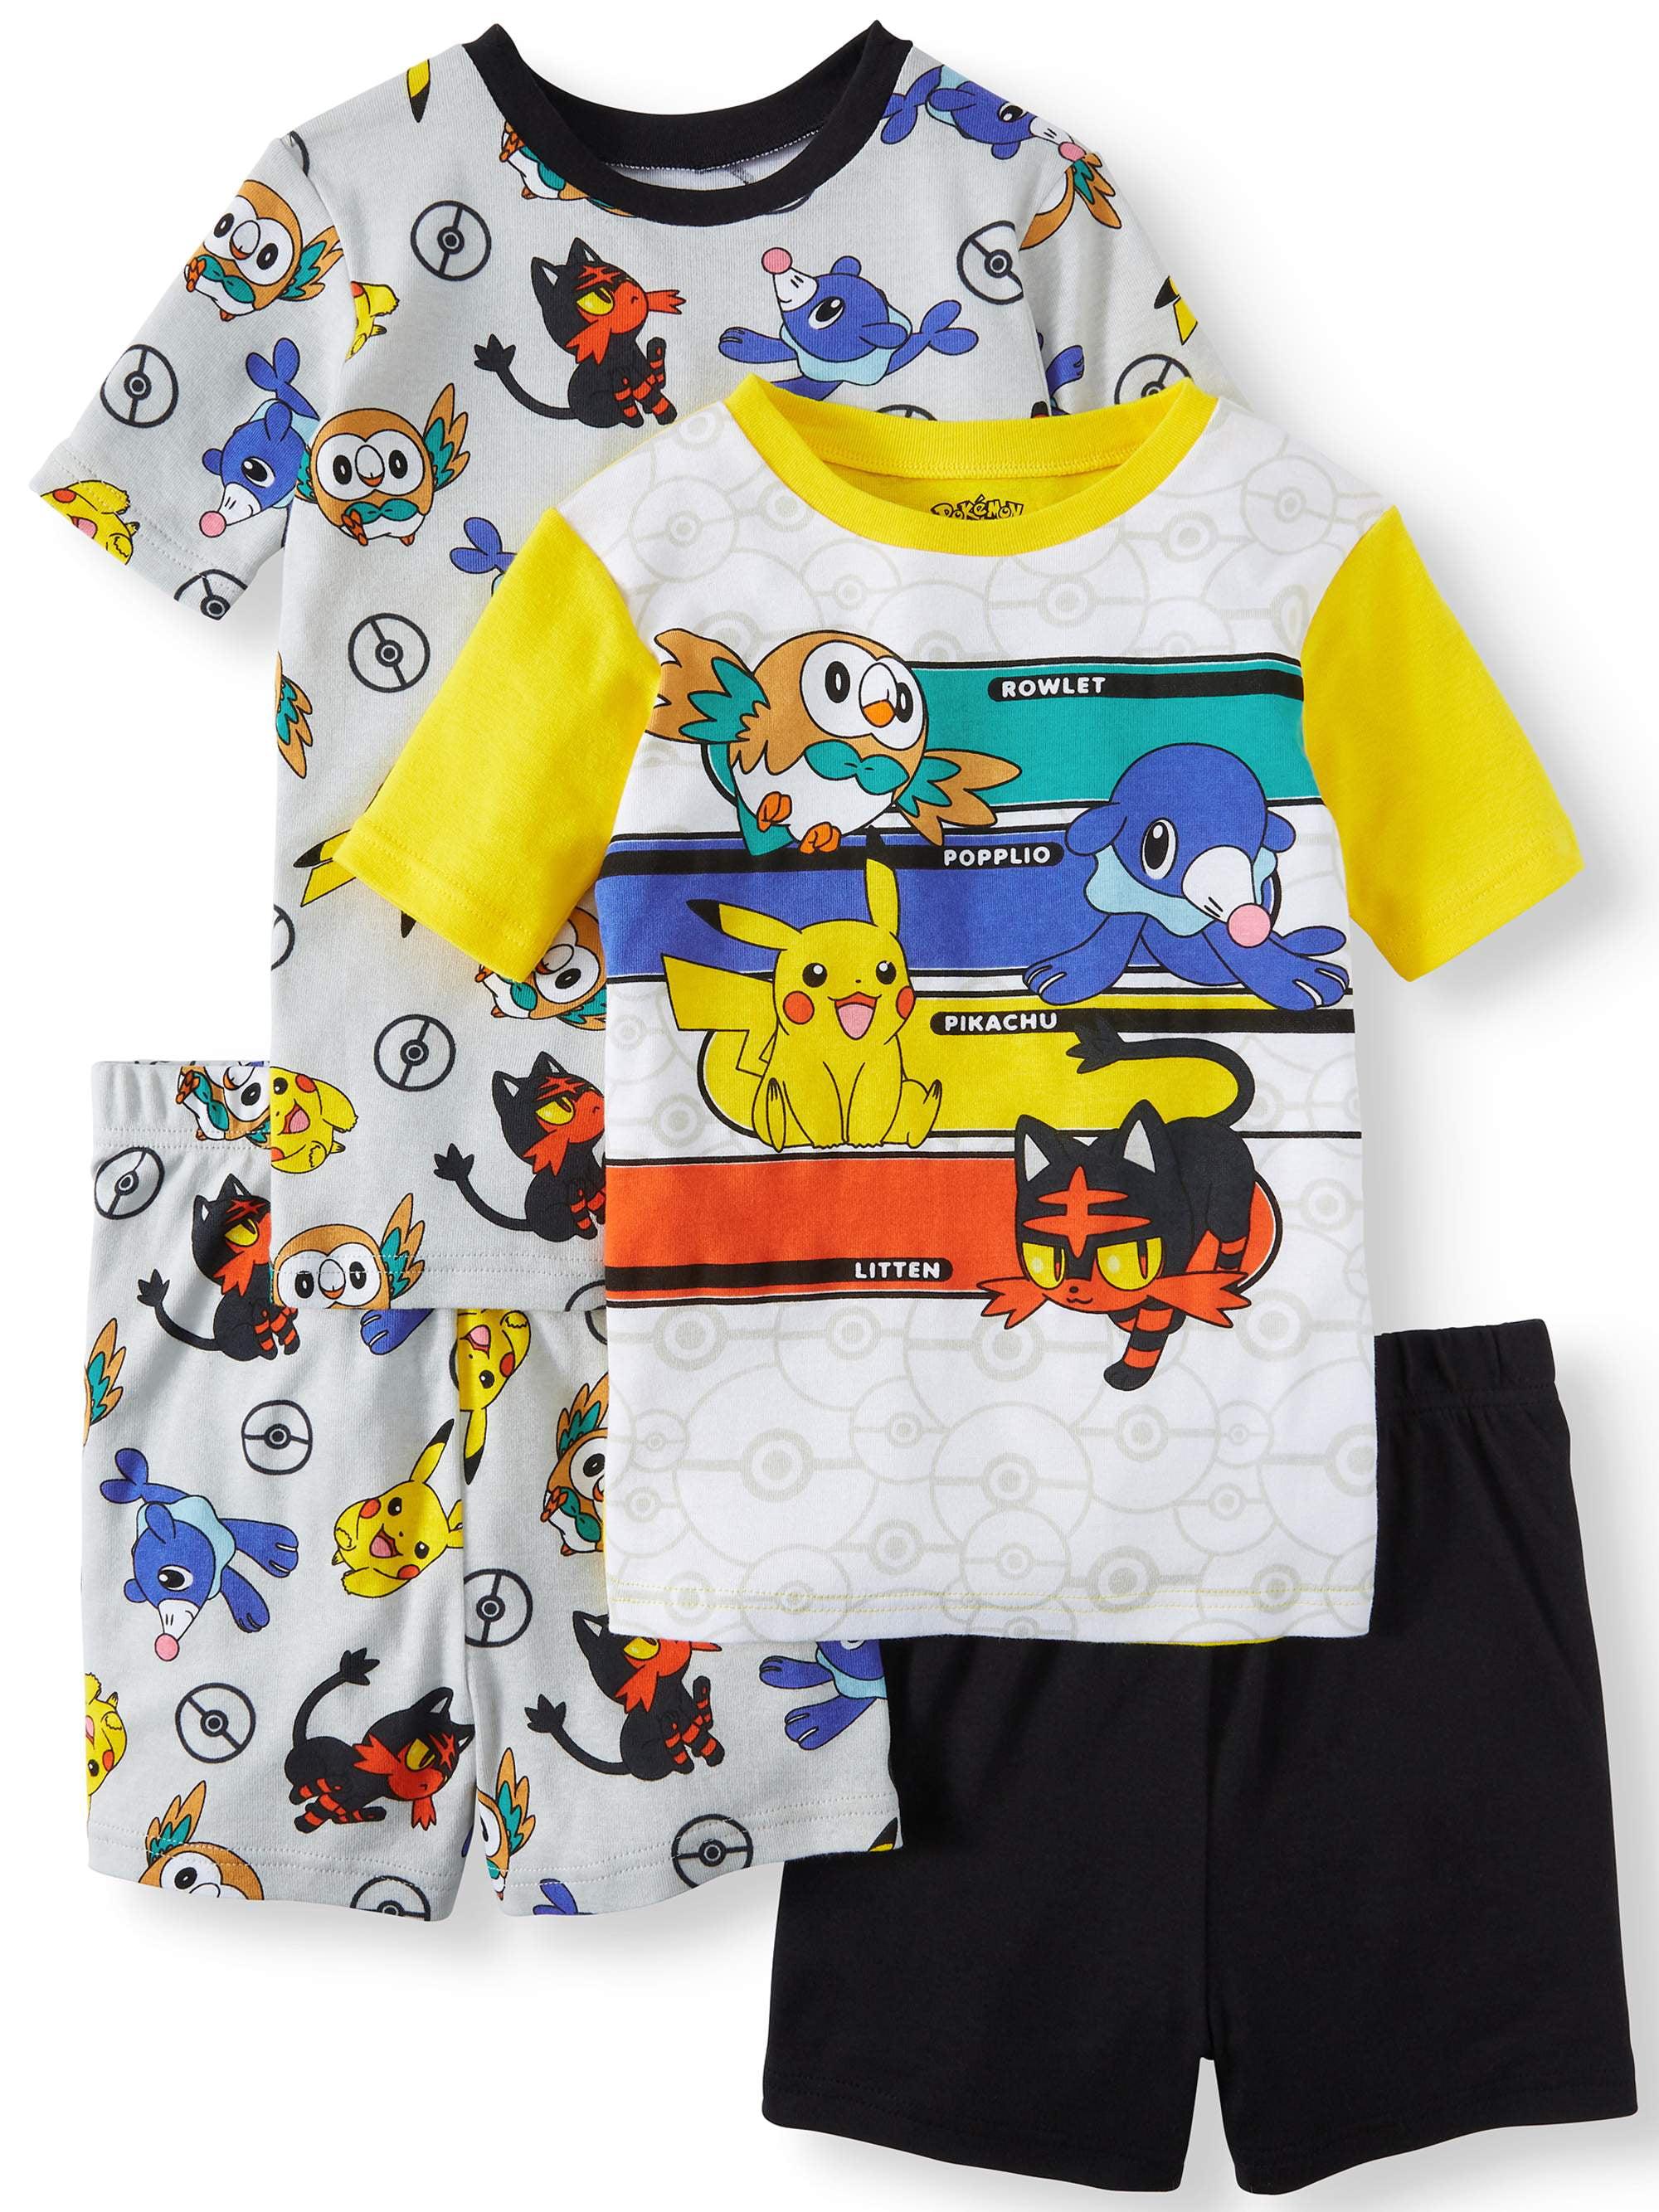 Boys' Pokemon 4 Piece Pajama Sleep Set (Little Boy & Big Boy)